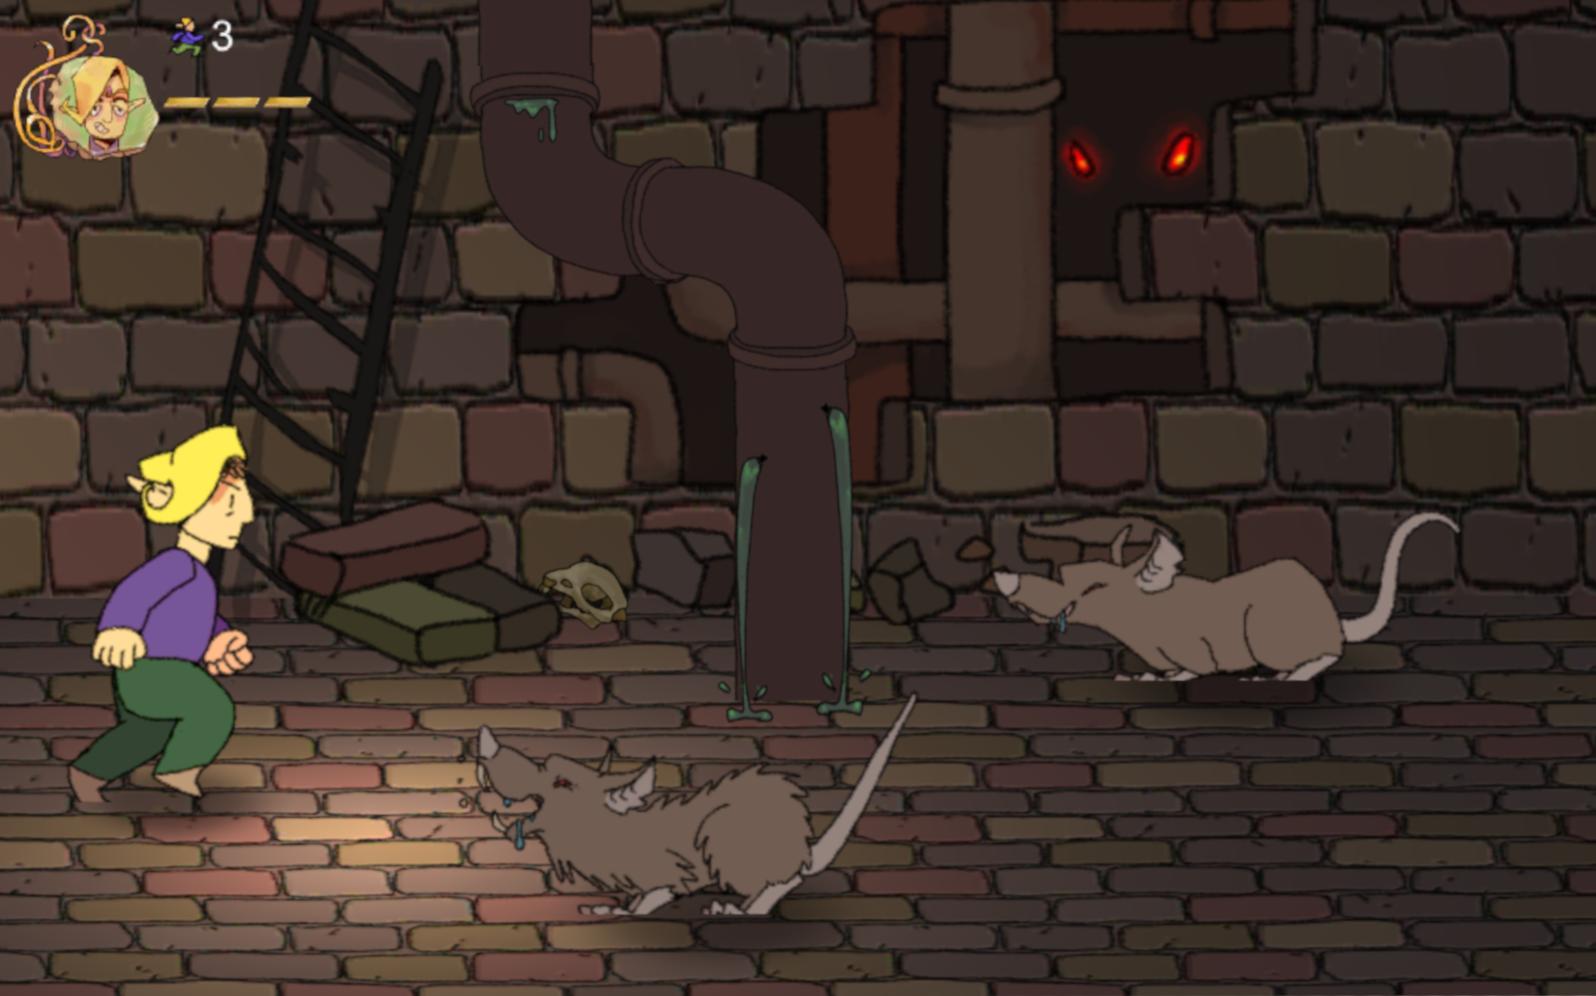 first game screenshot